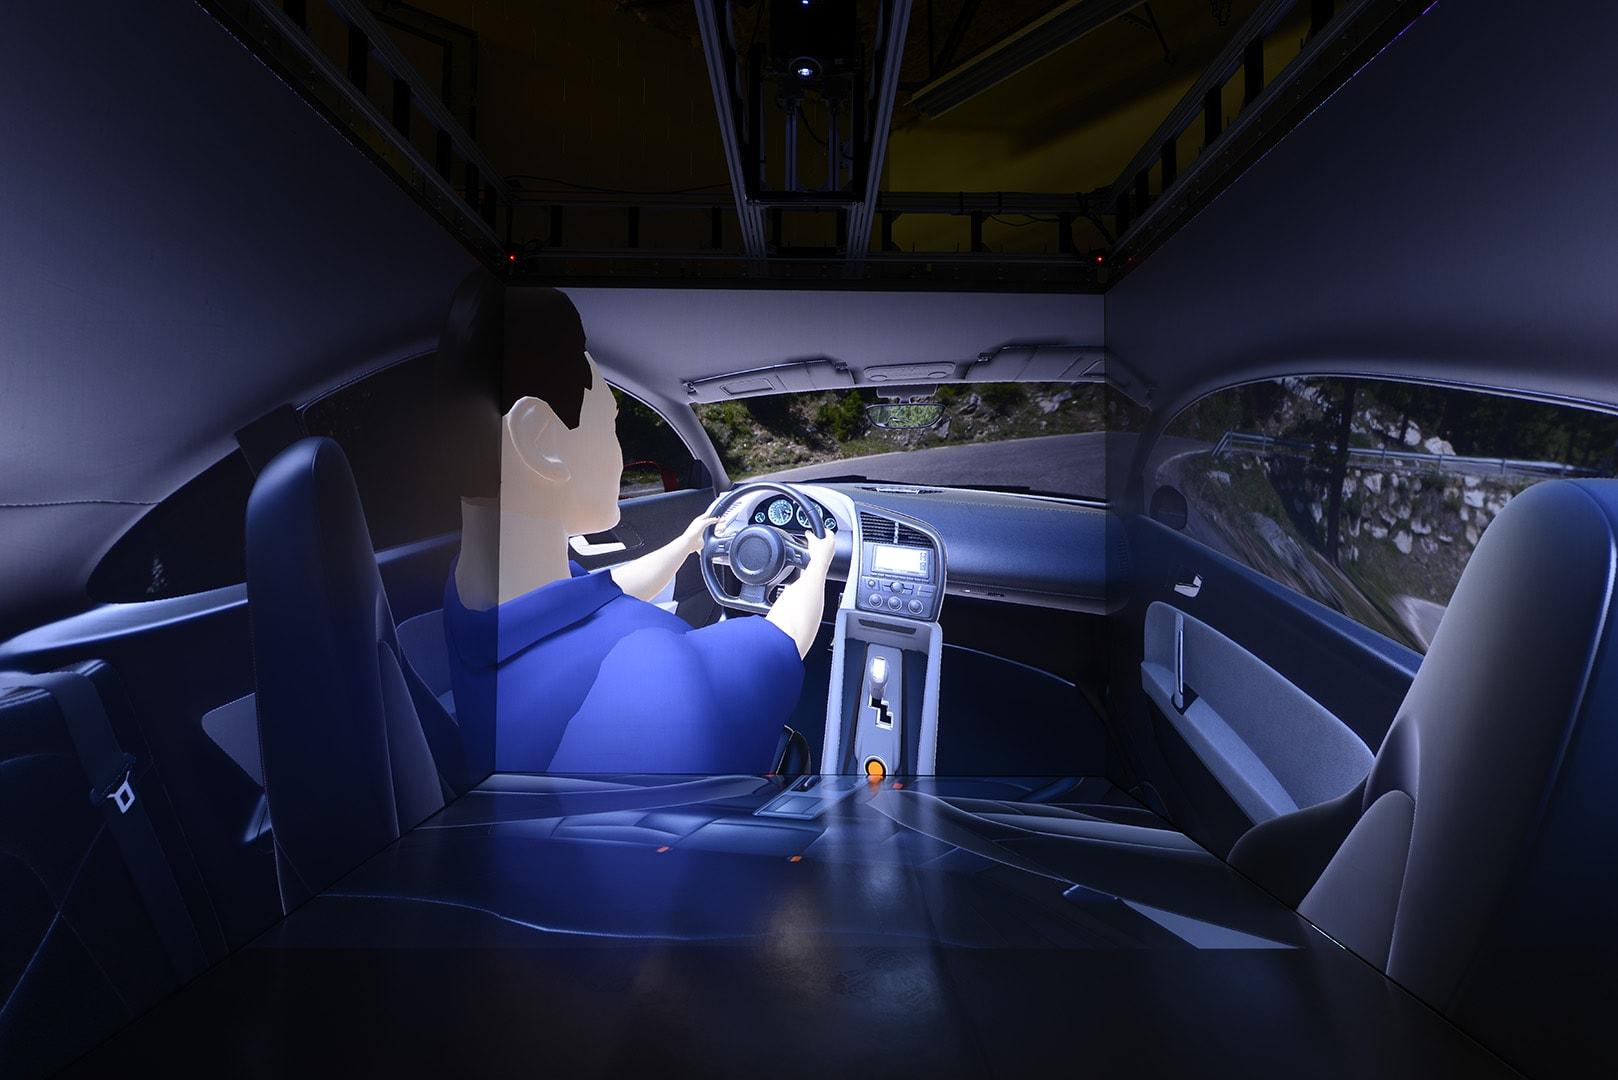 HD IGI CAVE visualization automotive simulation rendering